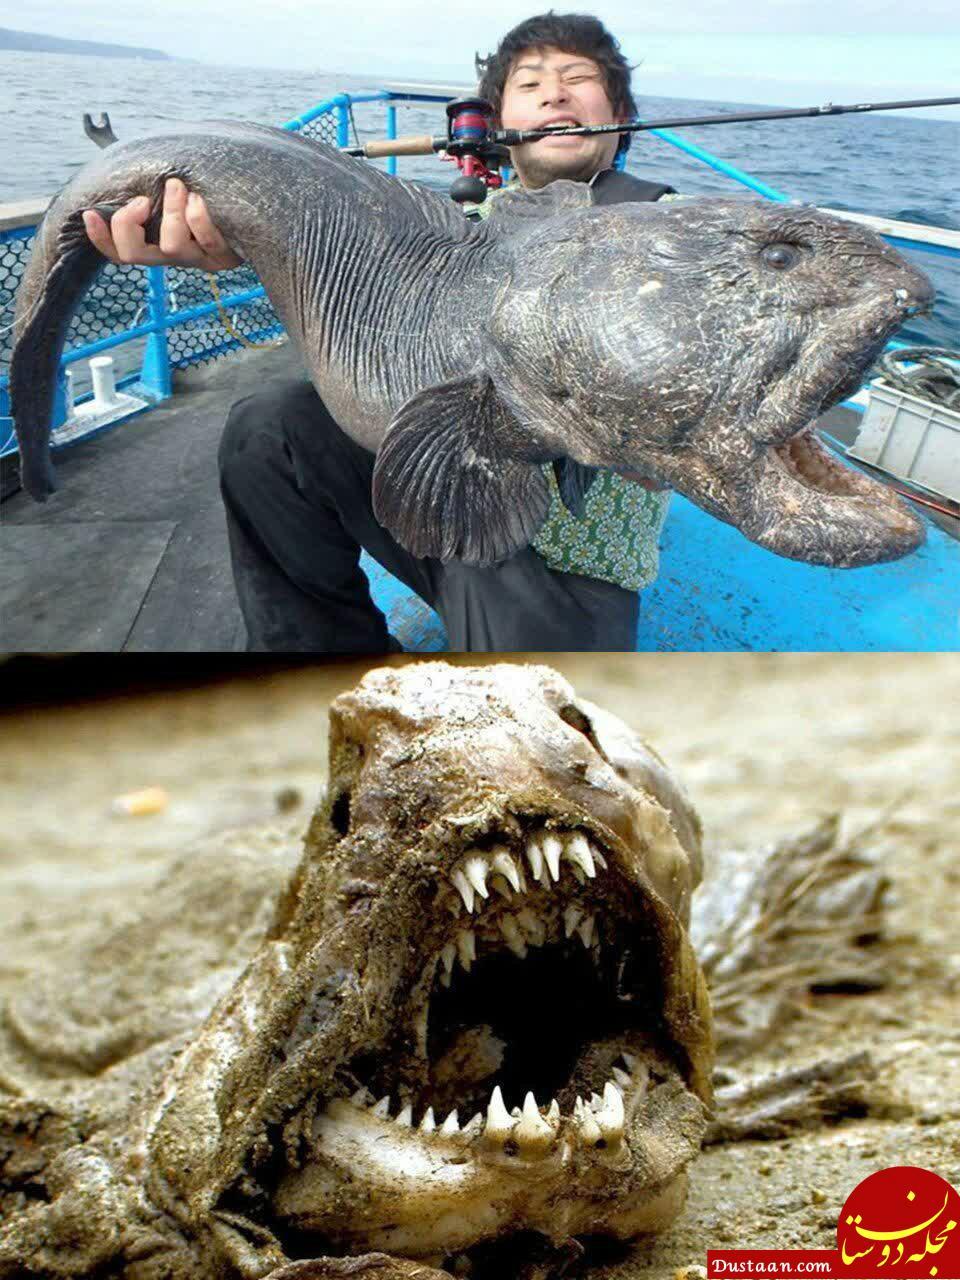 www.dustaan.com شکار بزرگترین گرگ ماهی جهان به طول 2 متر در ژاپن! +تصاویر